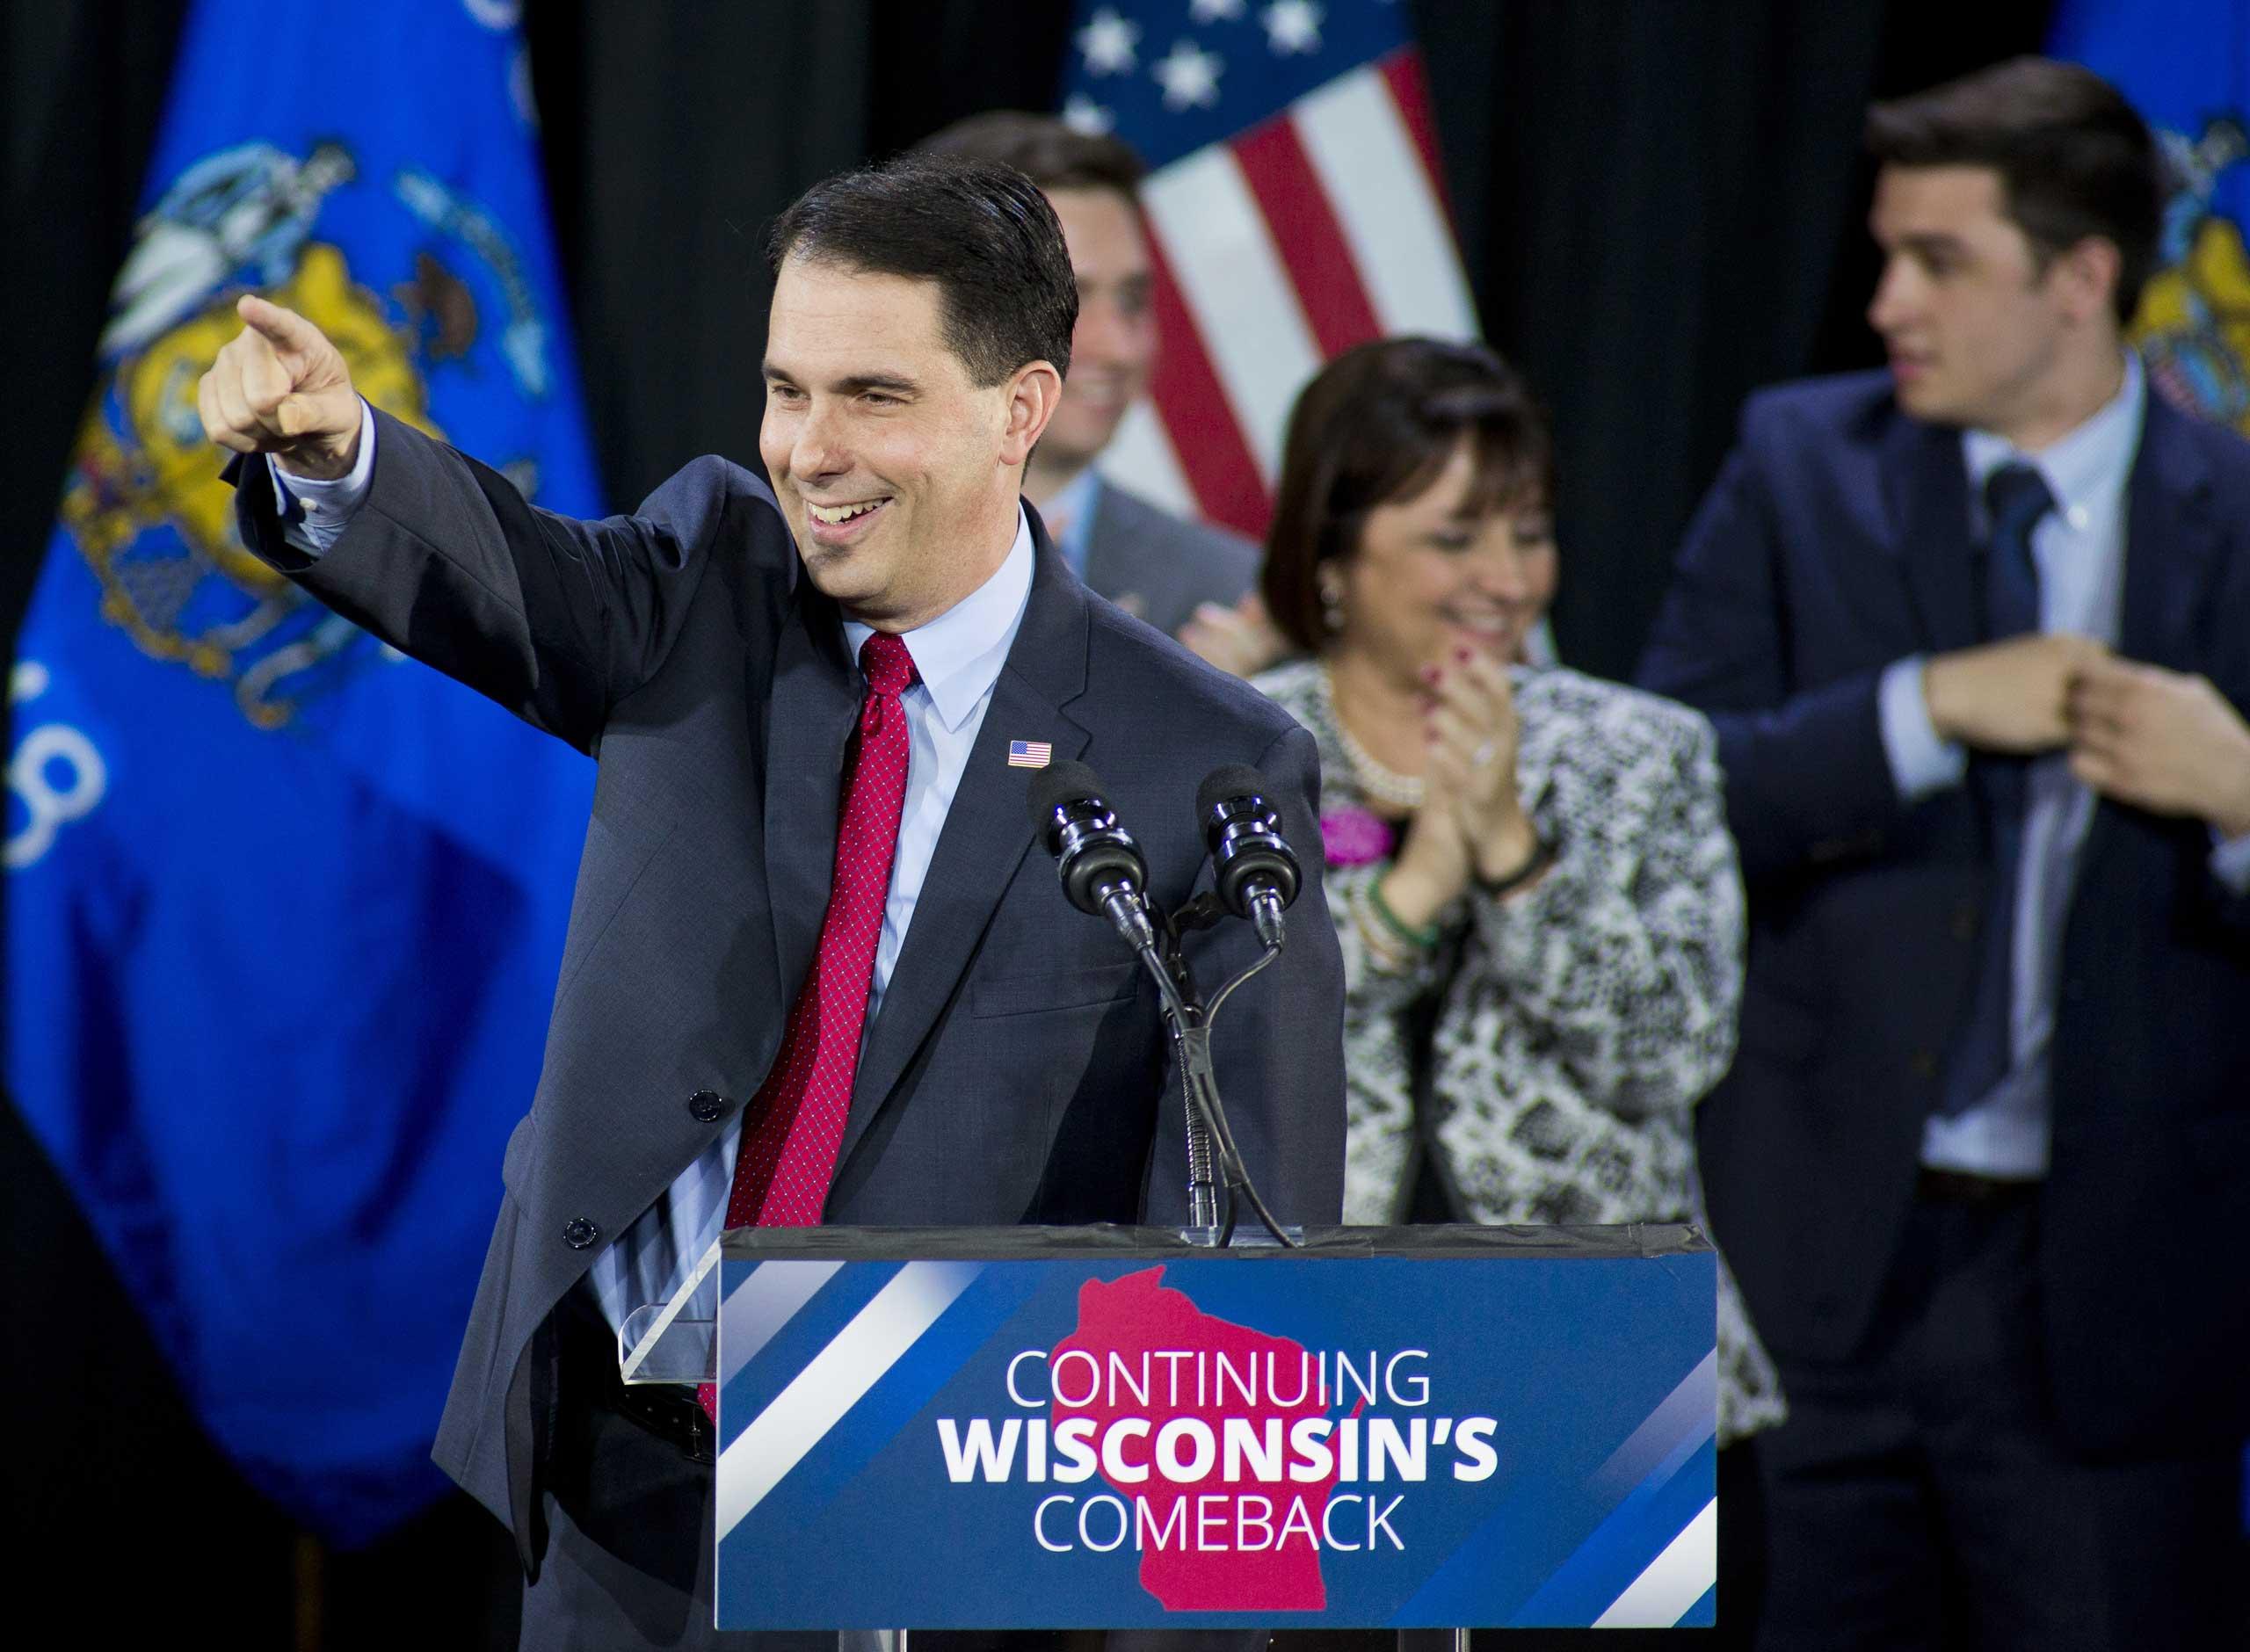 Wisconsin Gov. Scott Walker speaks at his election night party in West Allis, Wis., on Nov. 4, 2014